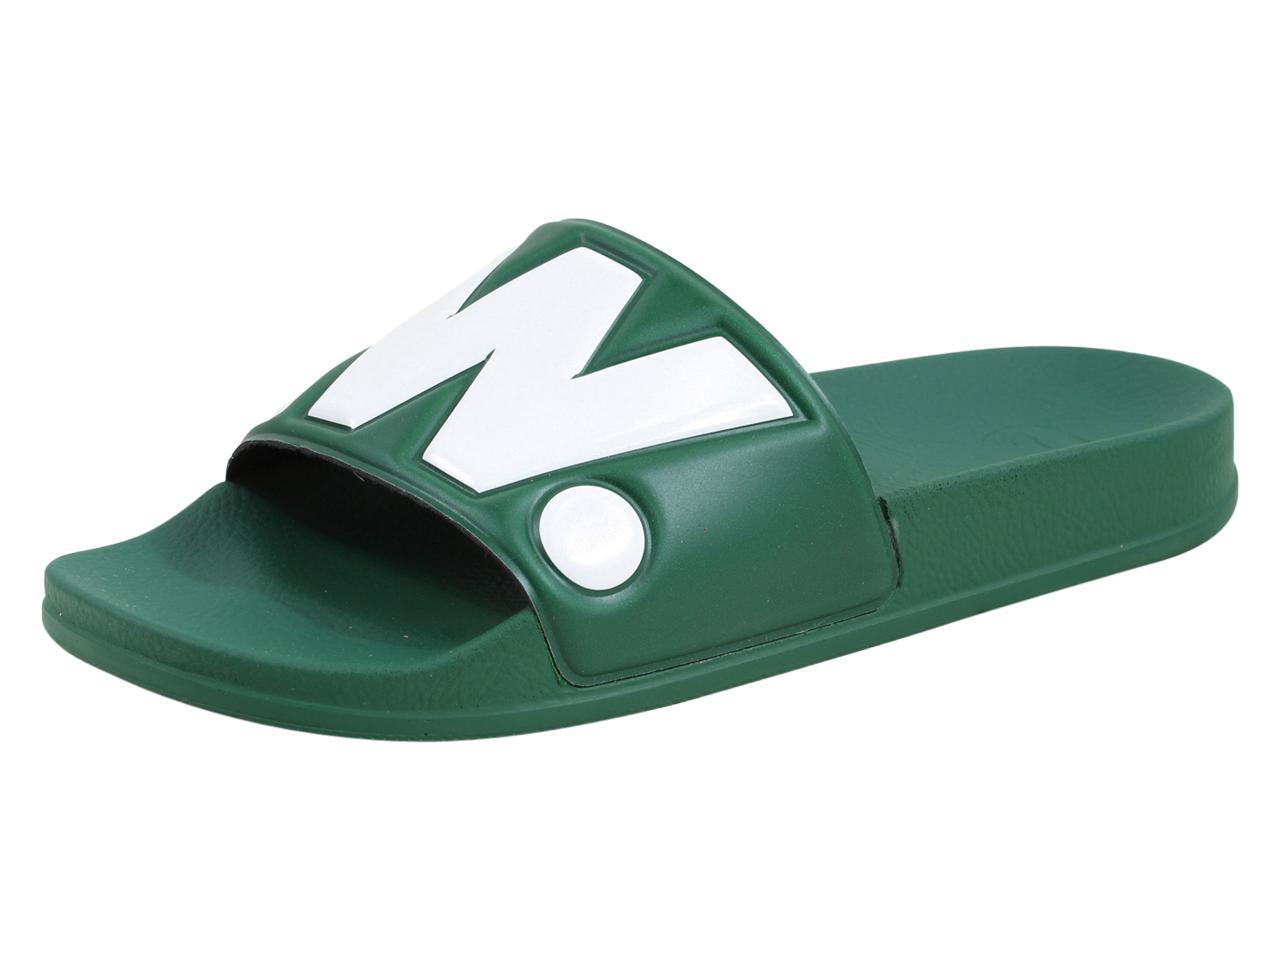 Image of G Star Raw Men's Cart Slide II Slides Sandals Shoes - Deep Nuri Green - 11 D(M) US